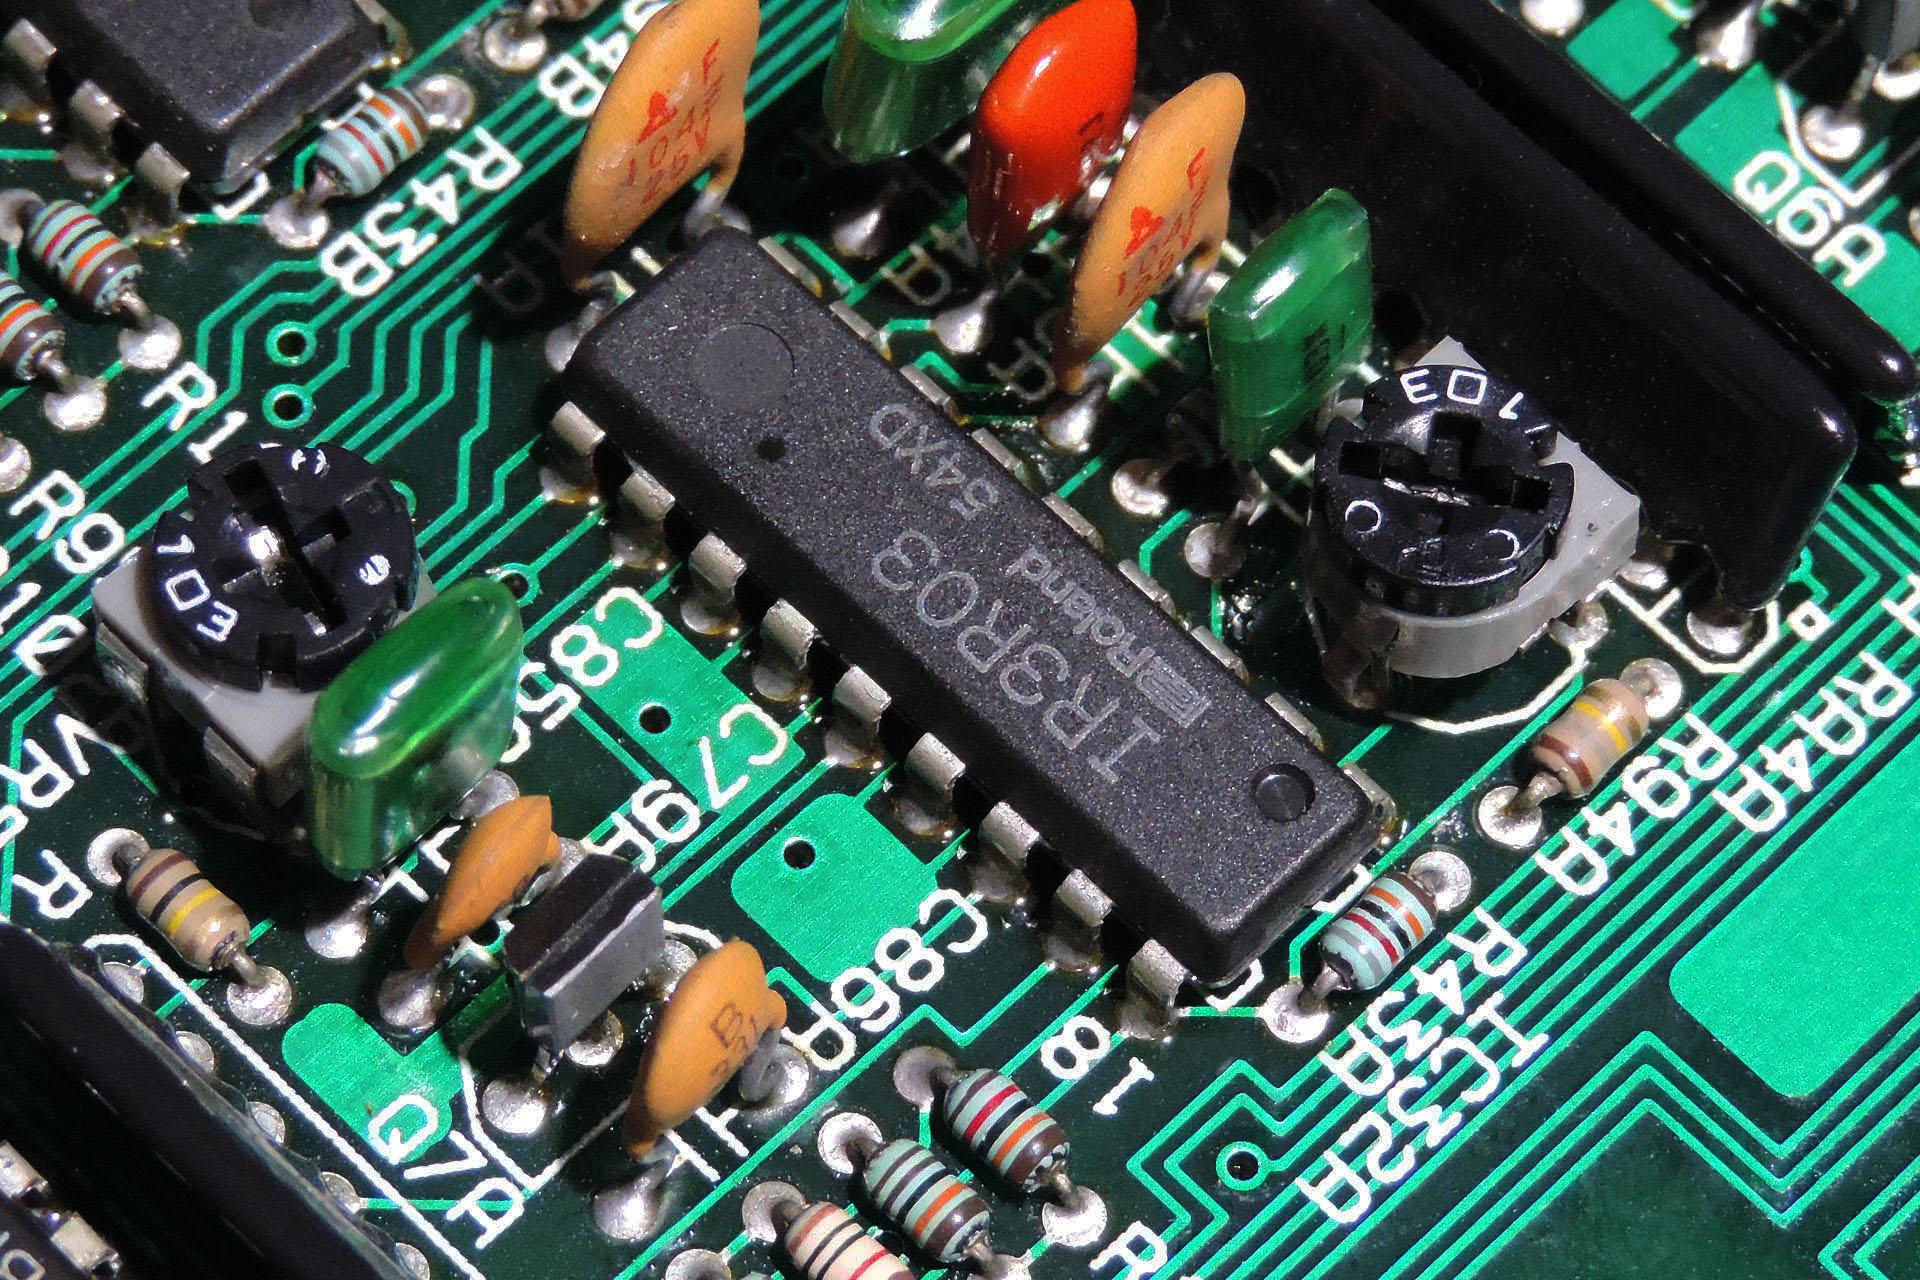 IR3R03 VCO in Roland MKS-80